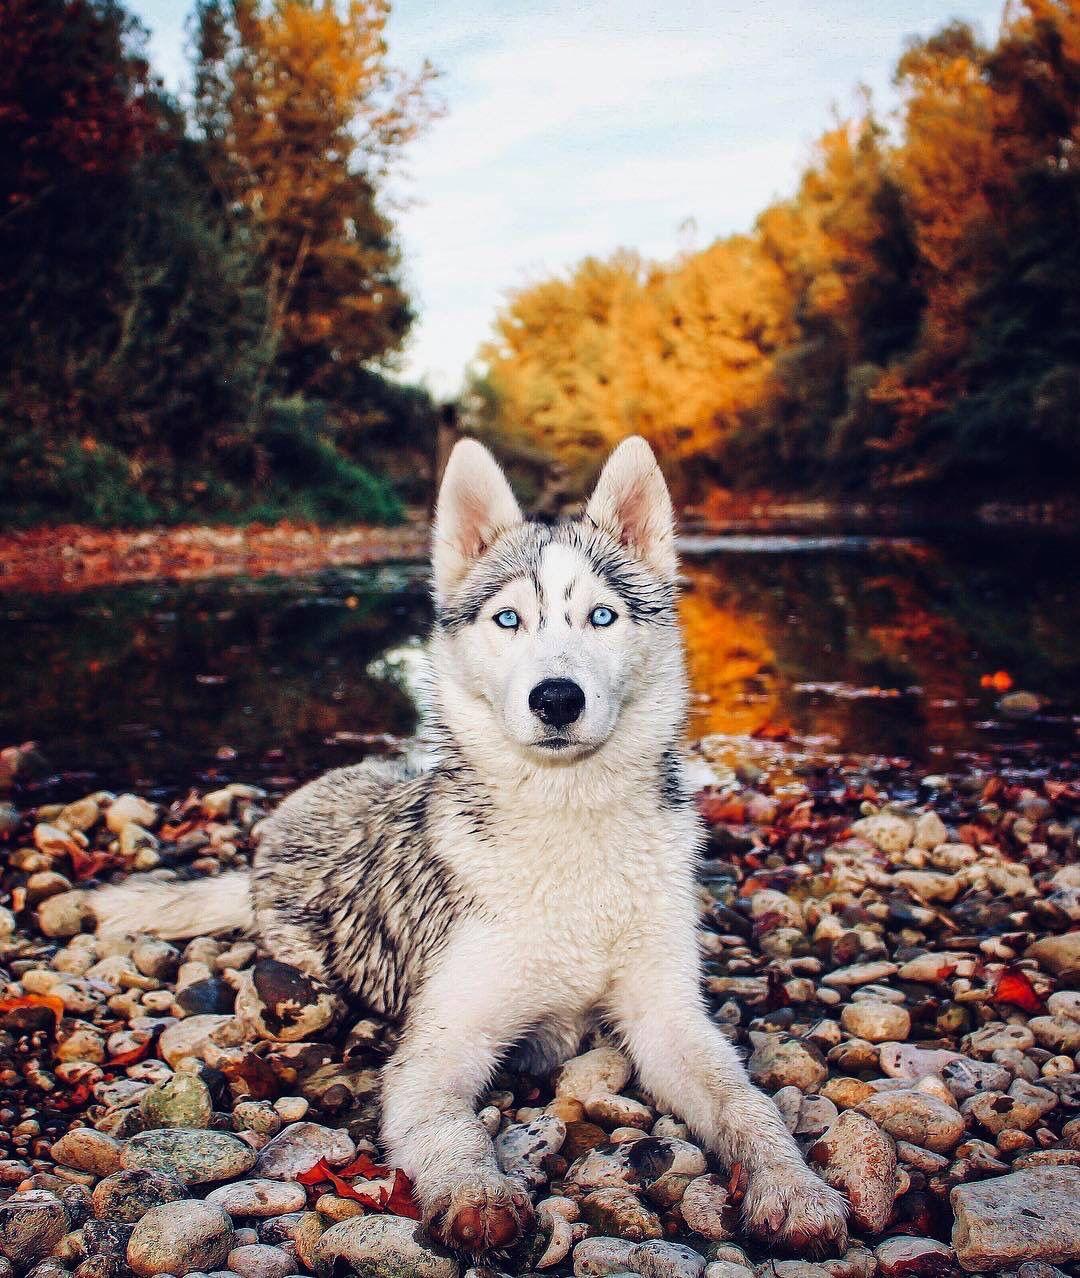 Blue Eyes Husky Best Dog Dogs Ever Love Cutie So Beautiful Fall